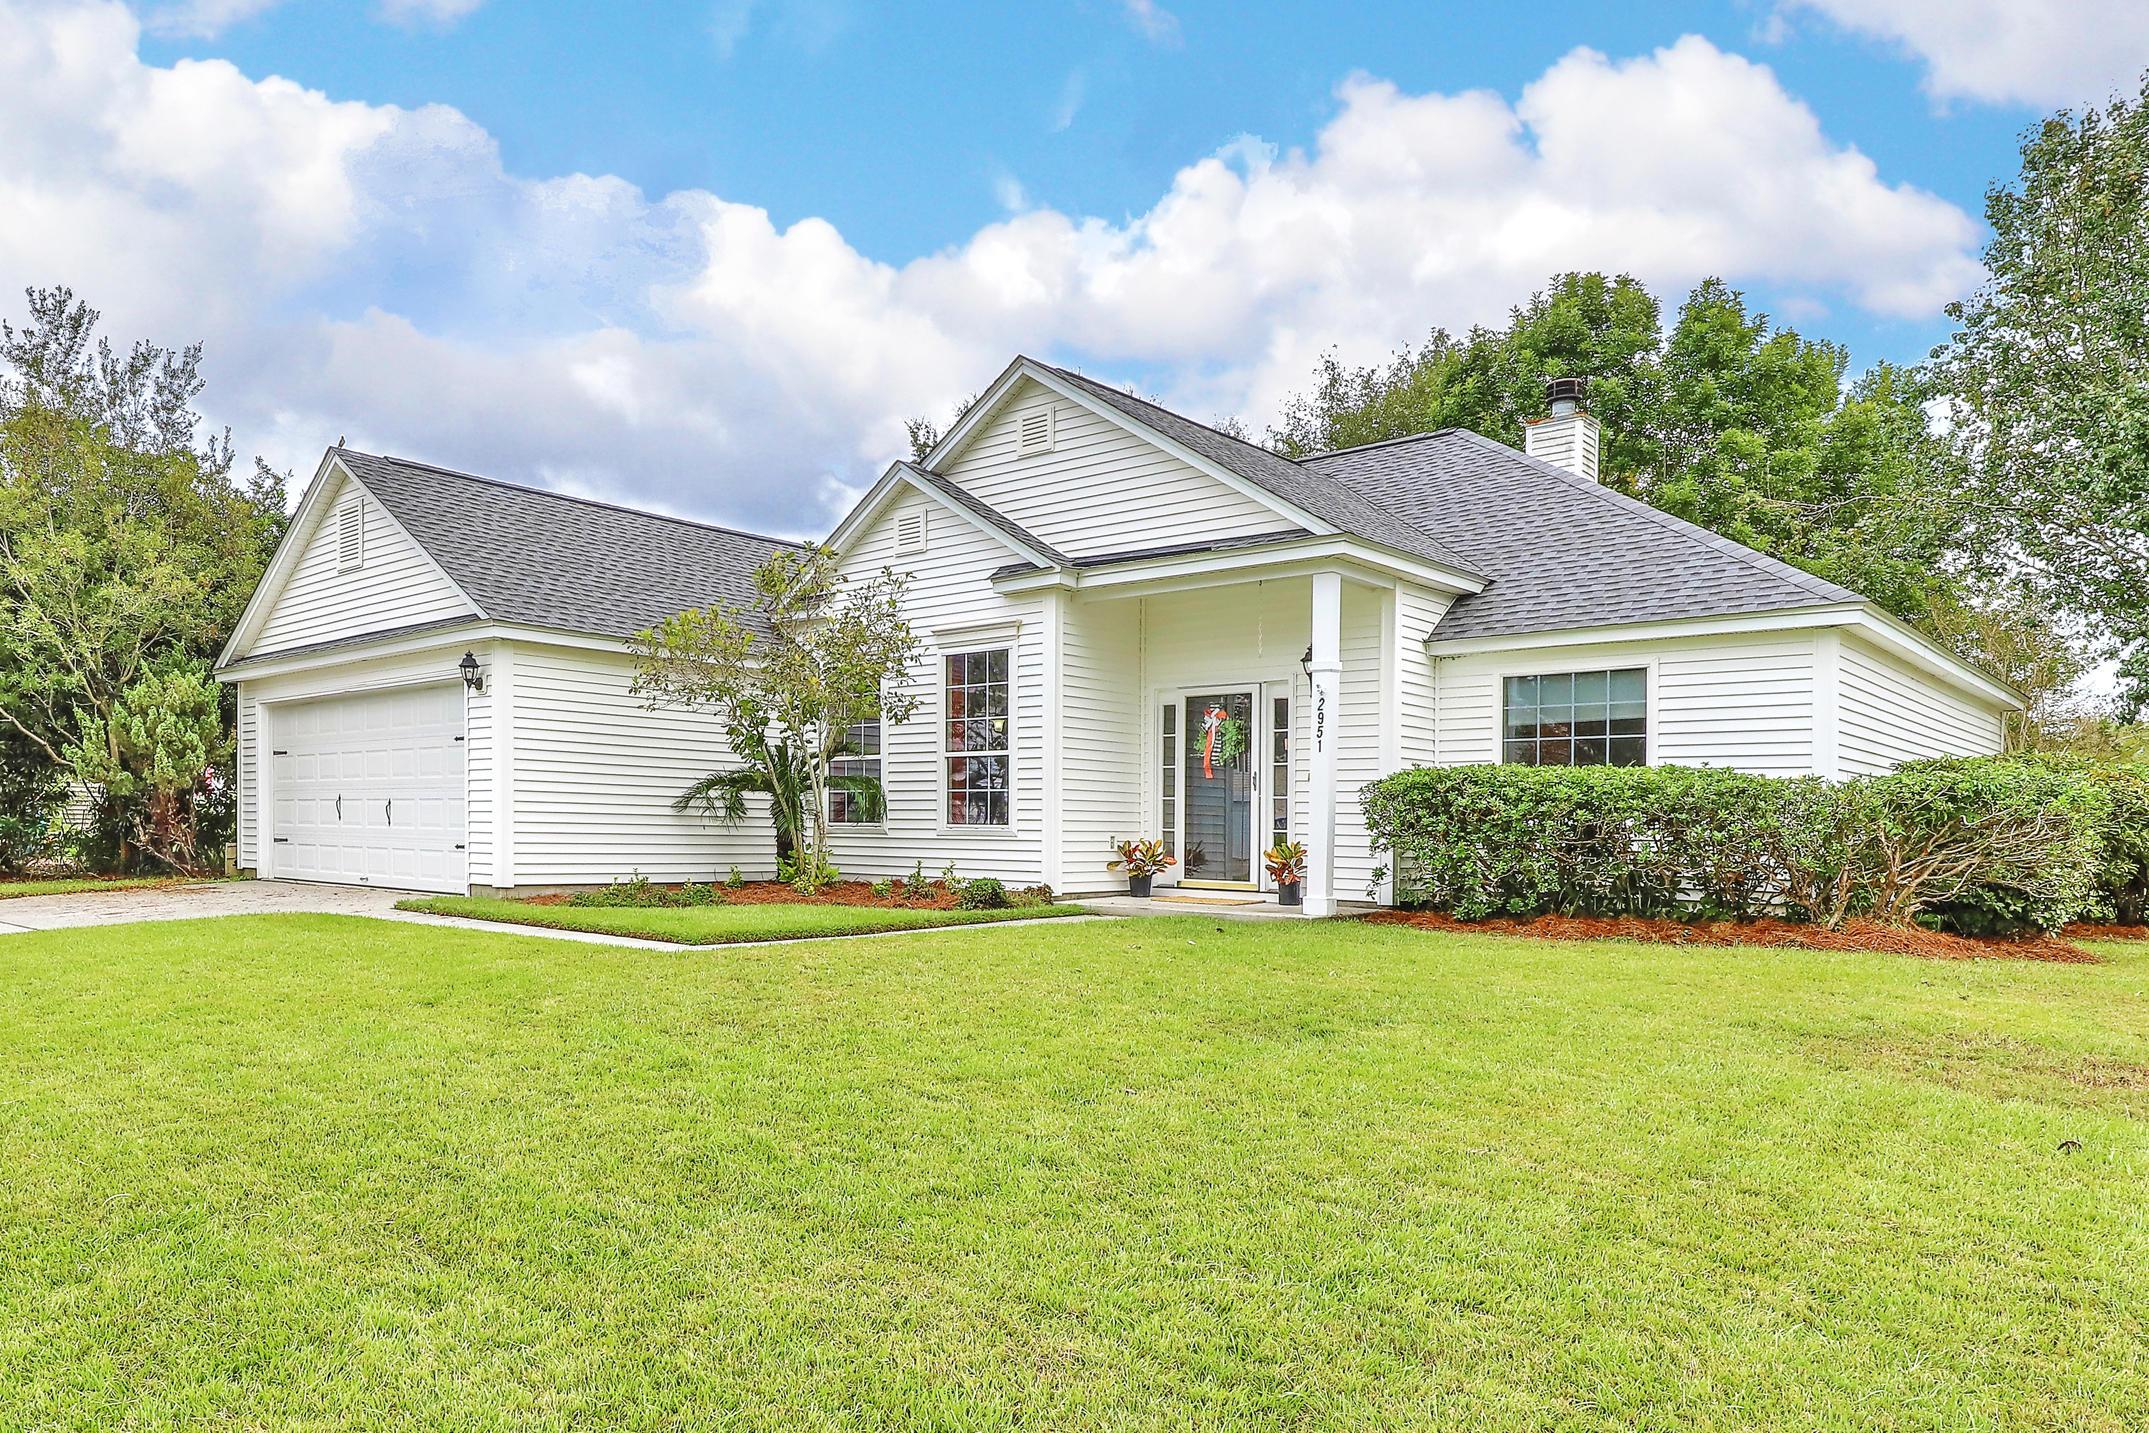 Planters Pointe Homes For Sale - 2951 Loebs, Mount Pleasant, SC - 20